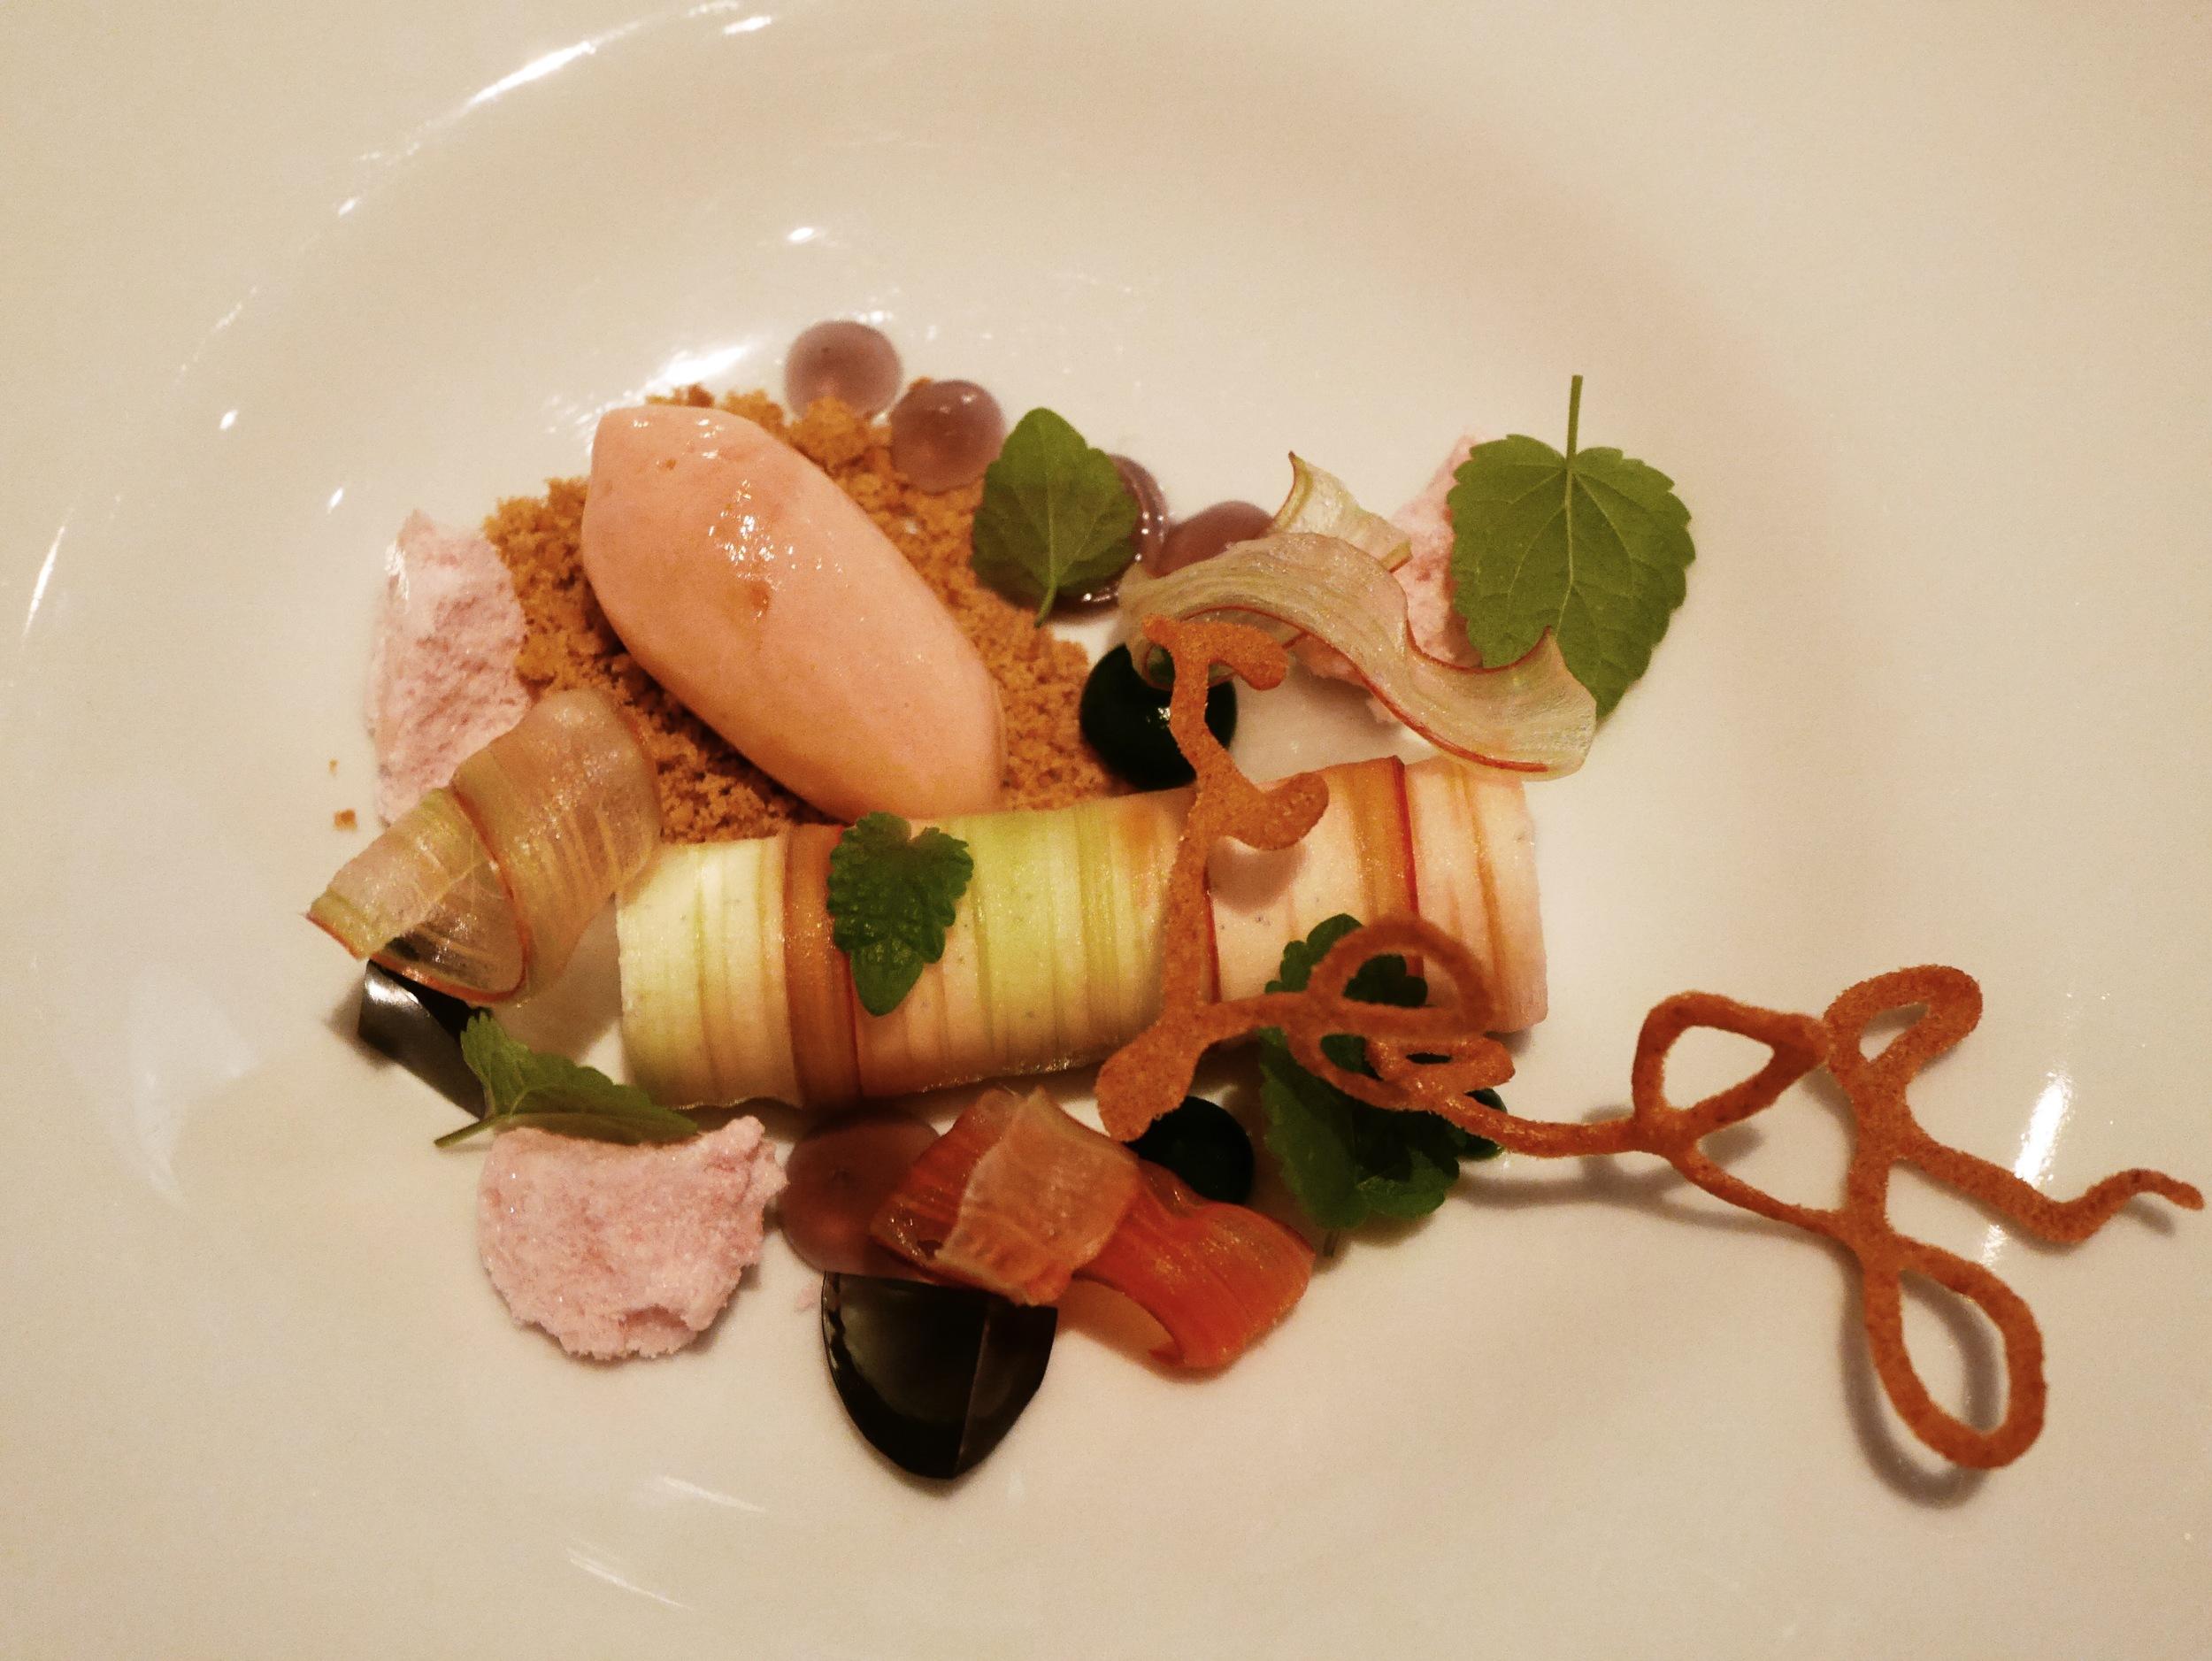 Rhubarb, violet, graham, anise hyssop